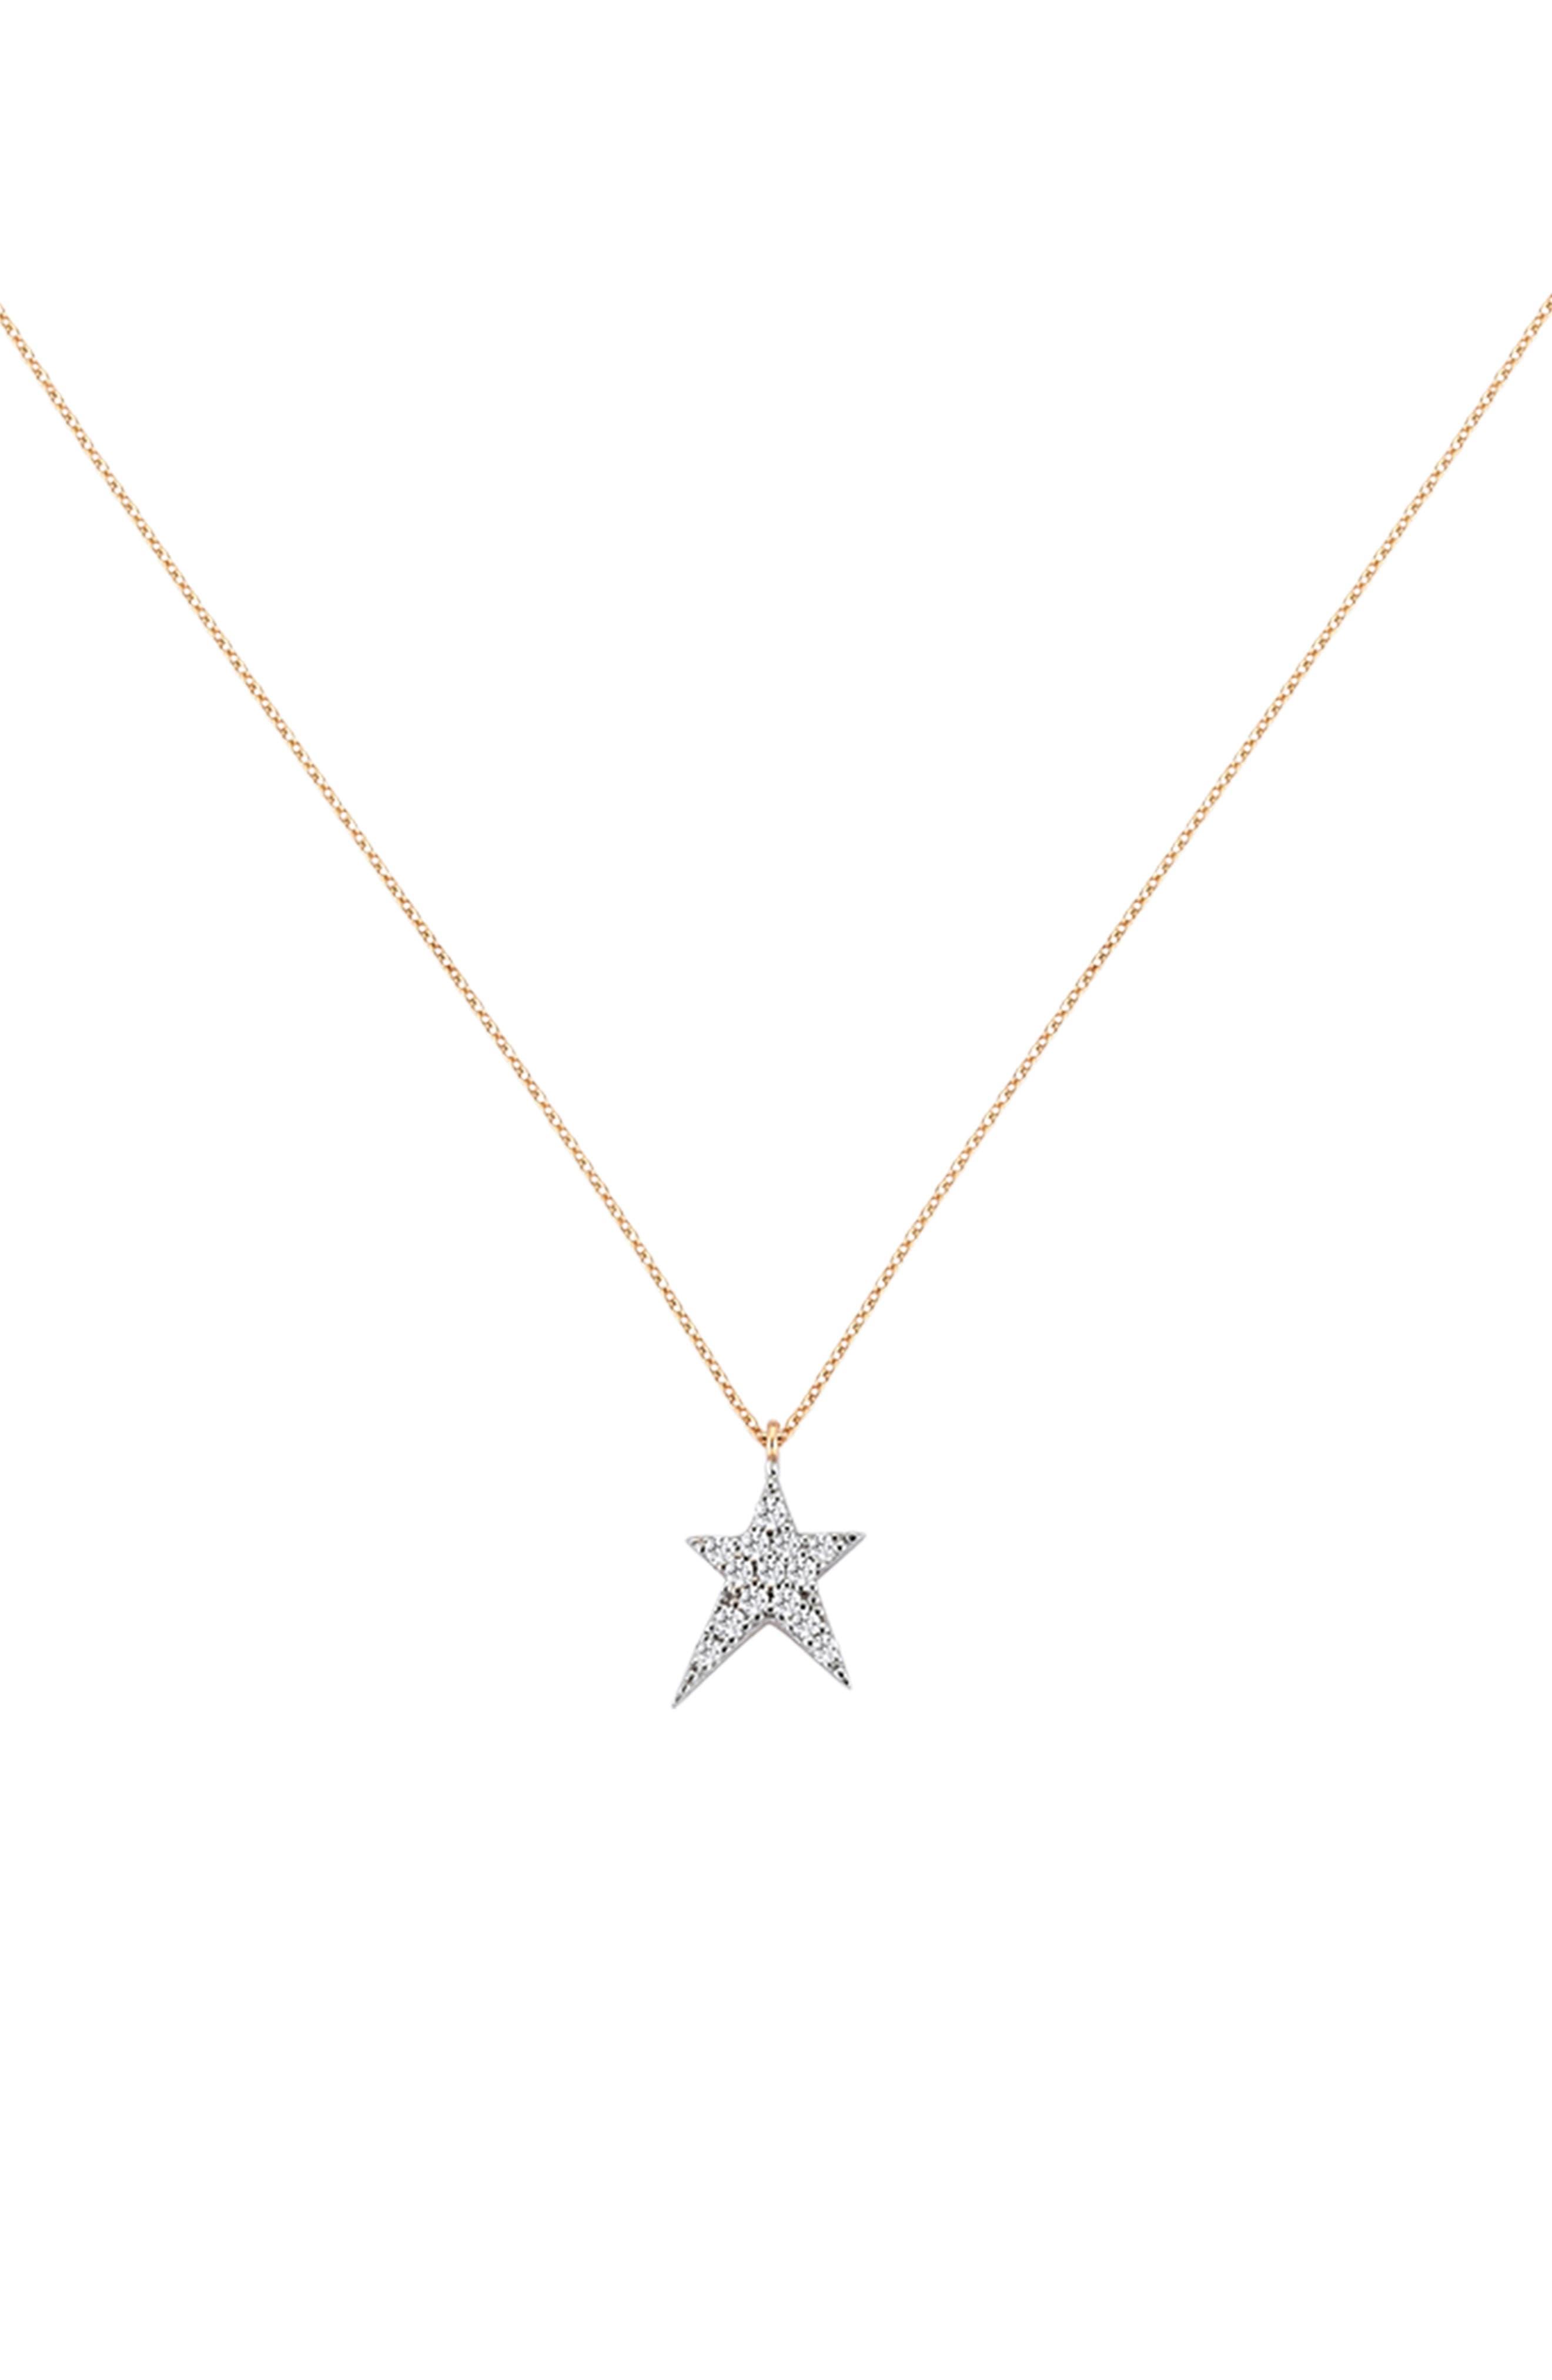 KISMET BY MILKA Struck Star Diamond Necklace, Main, color, 712